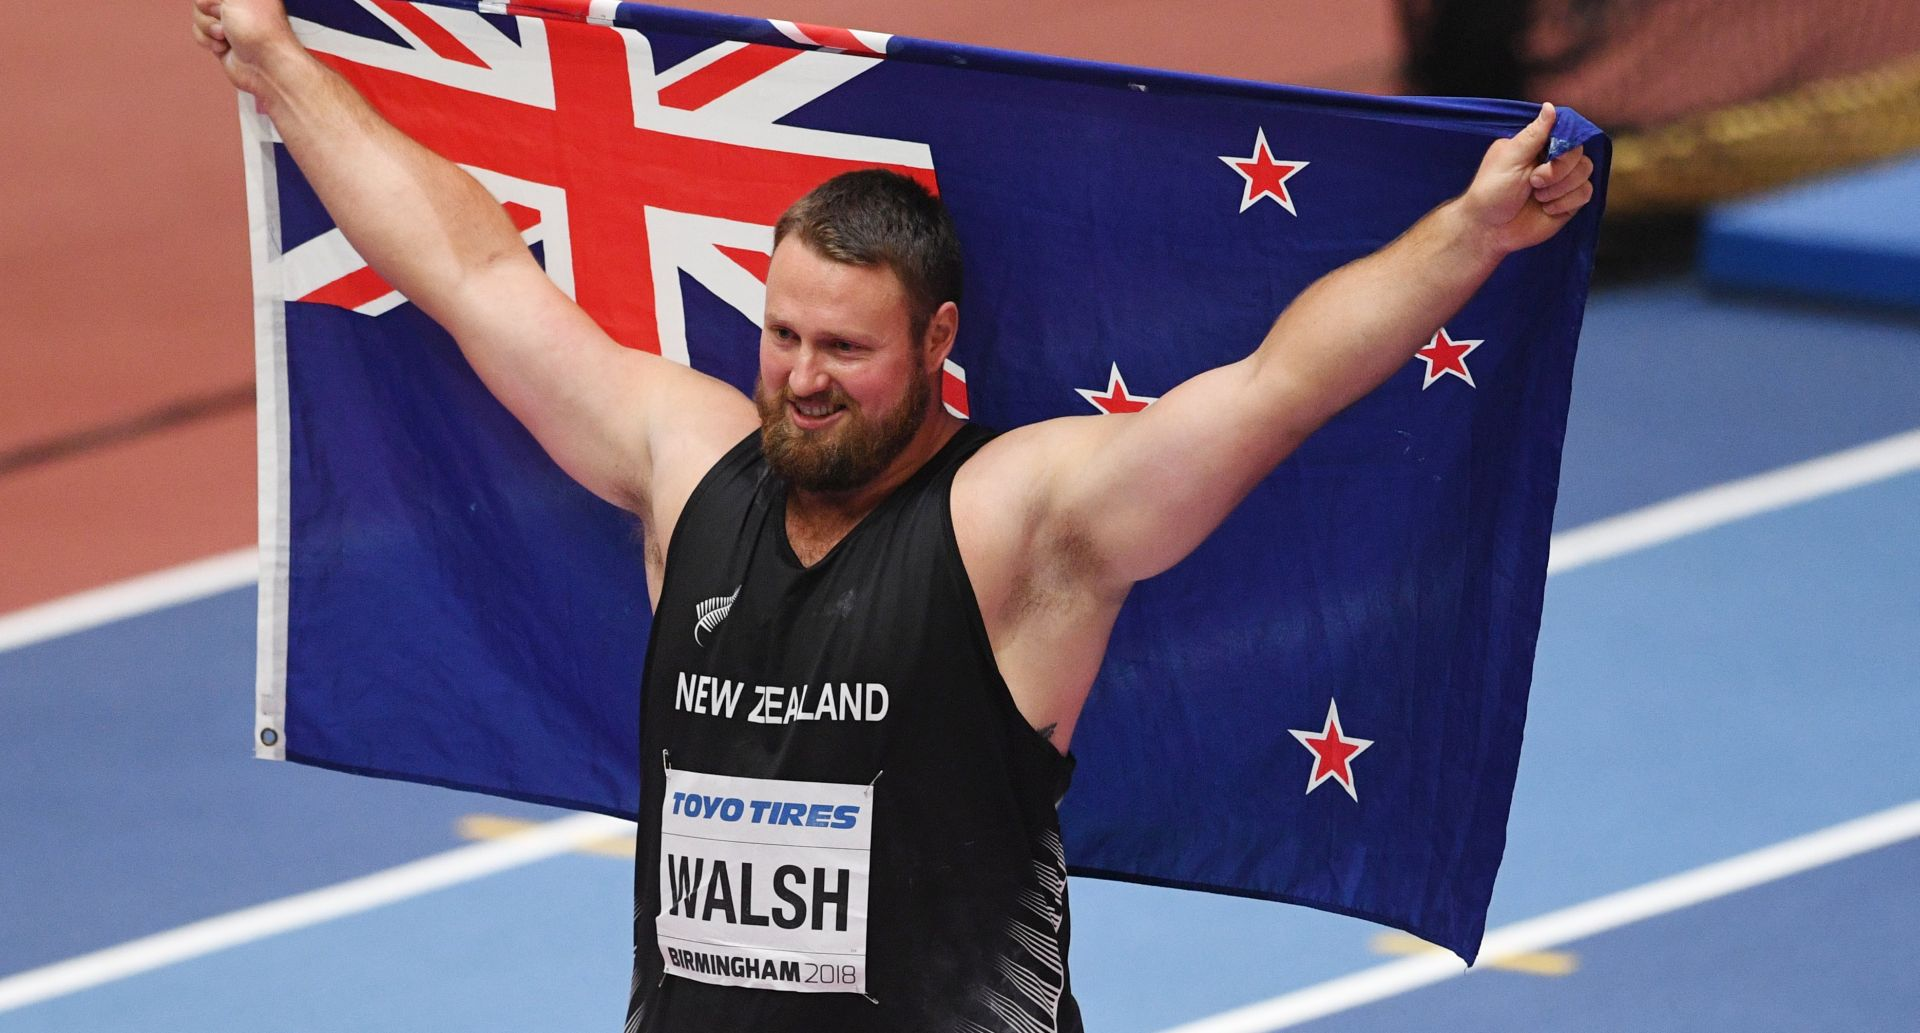 Walshu zlato s novim rekordom svjetskih prvenstava